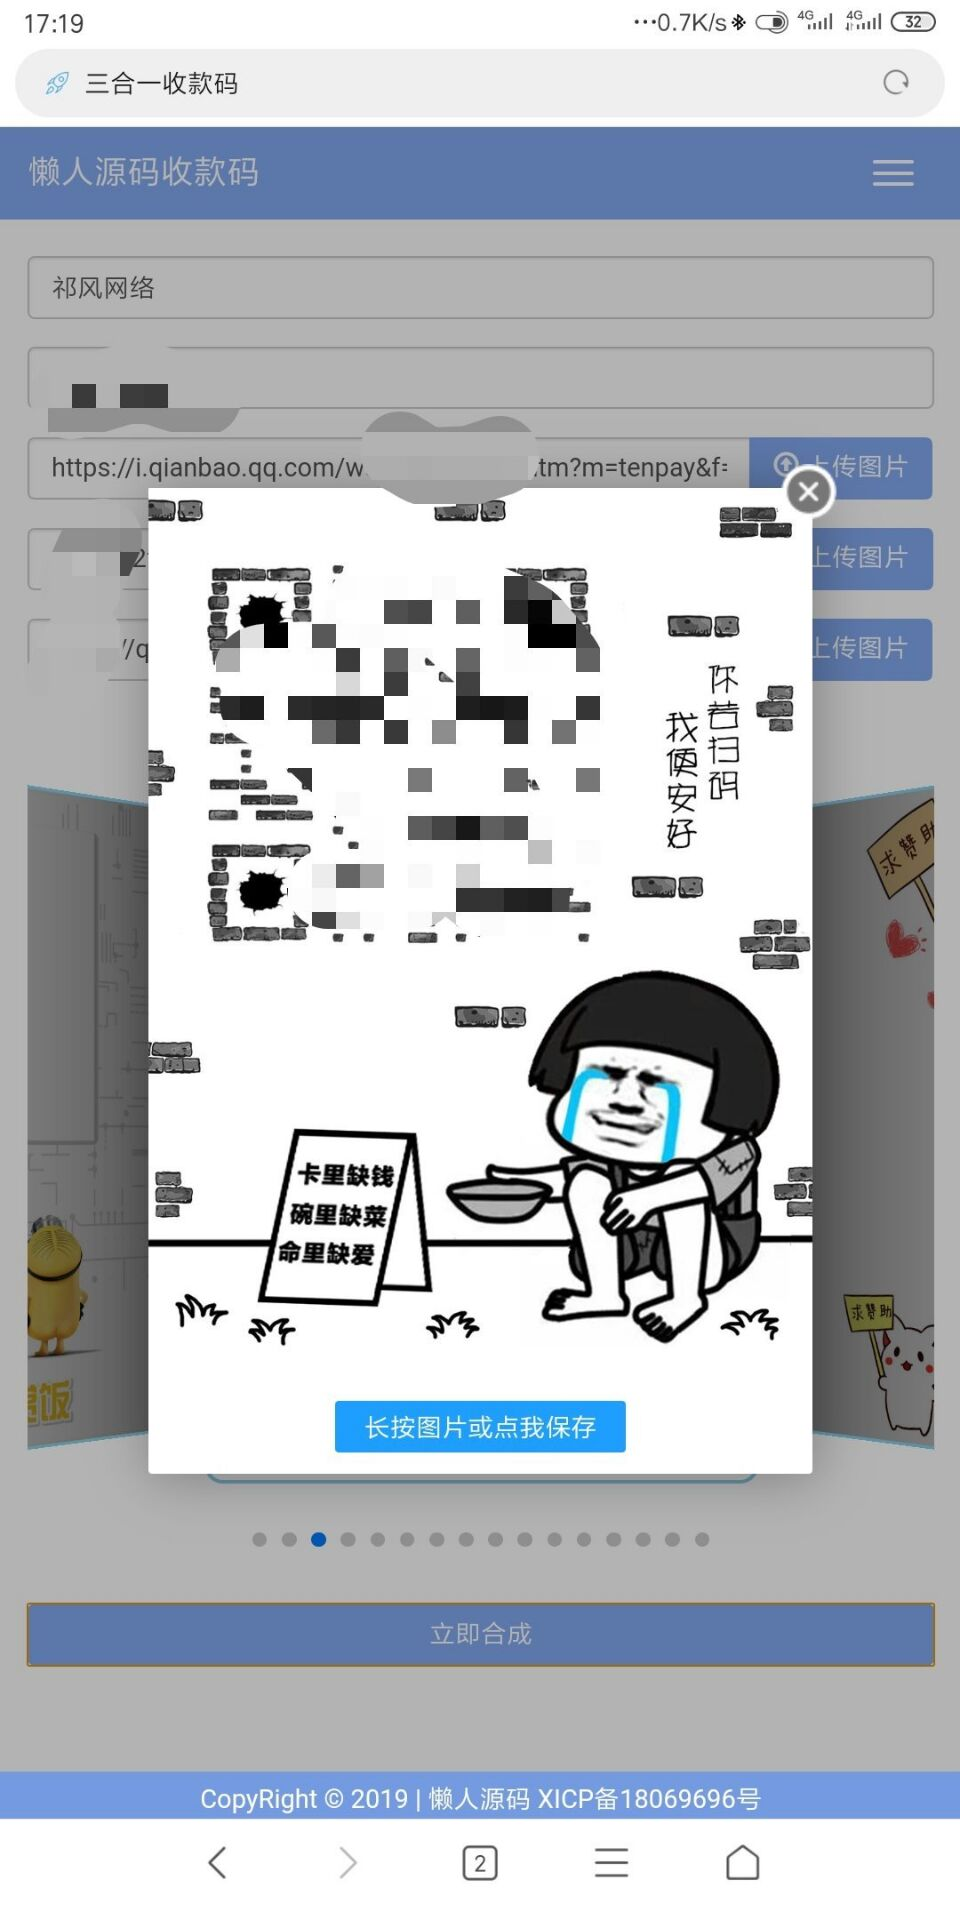 QQ微信支付宝三合一收款码生成源码